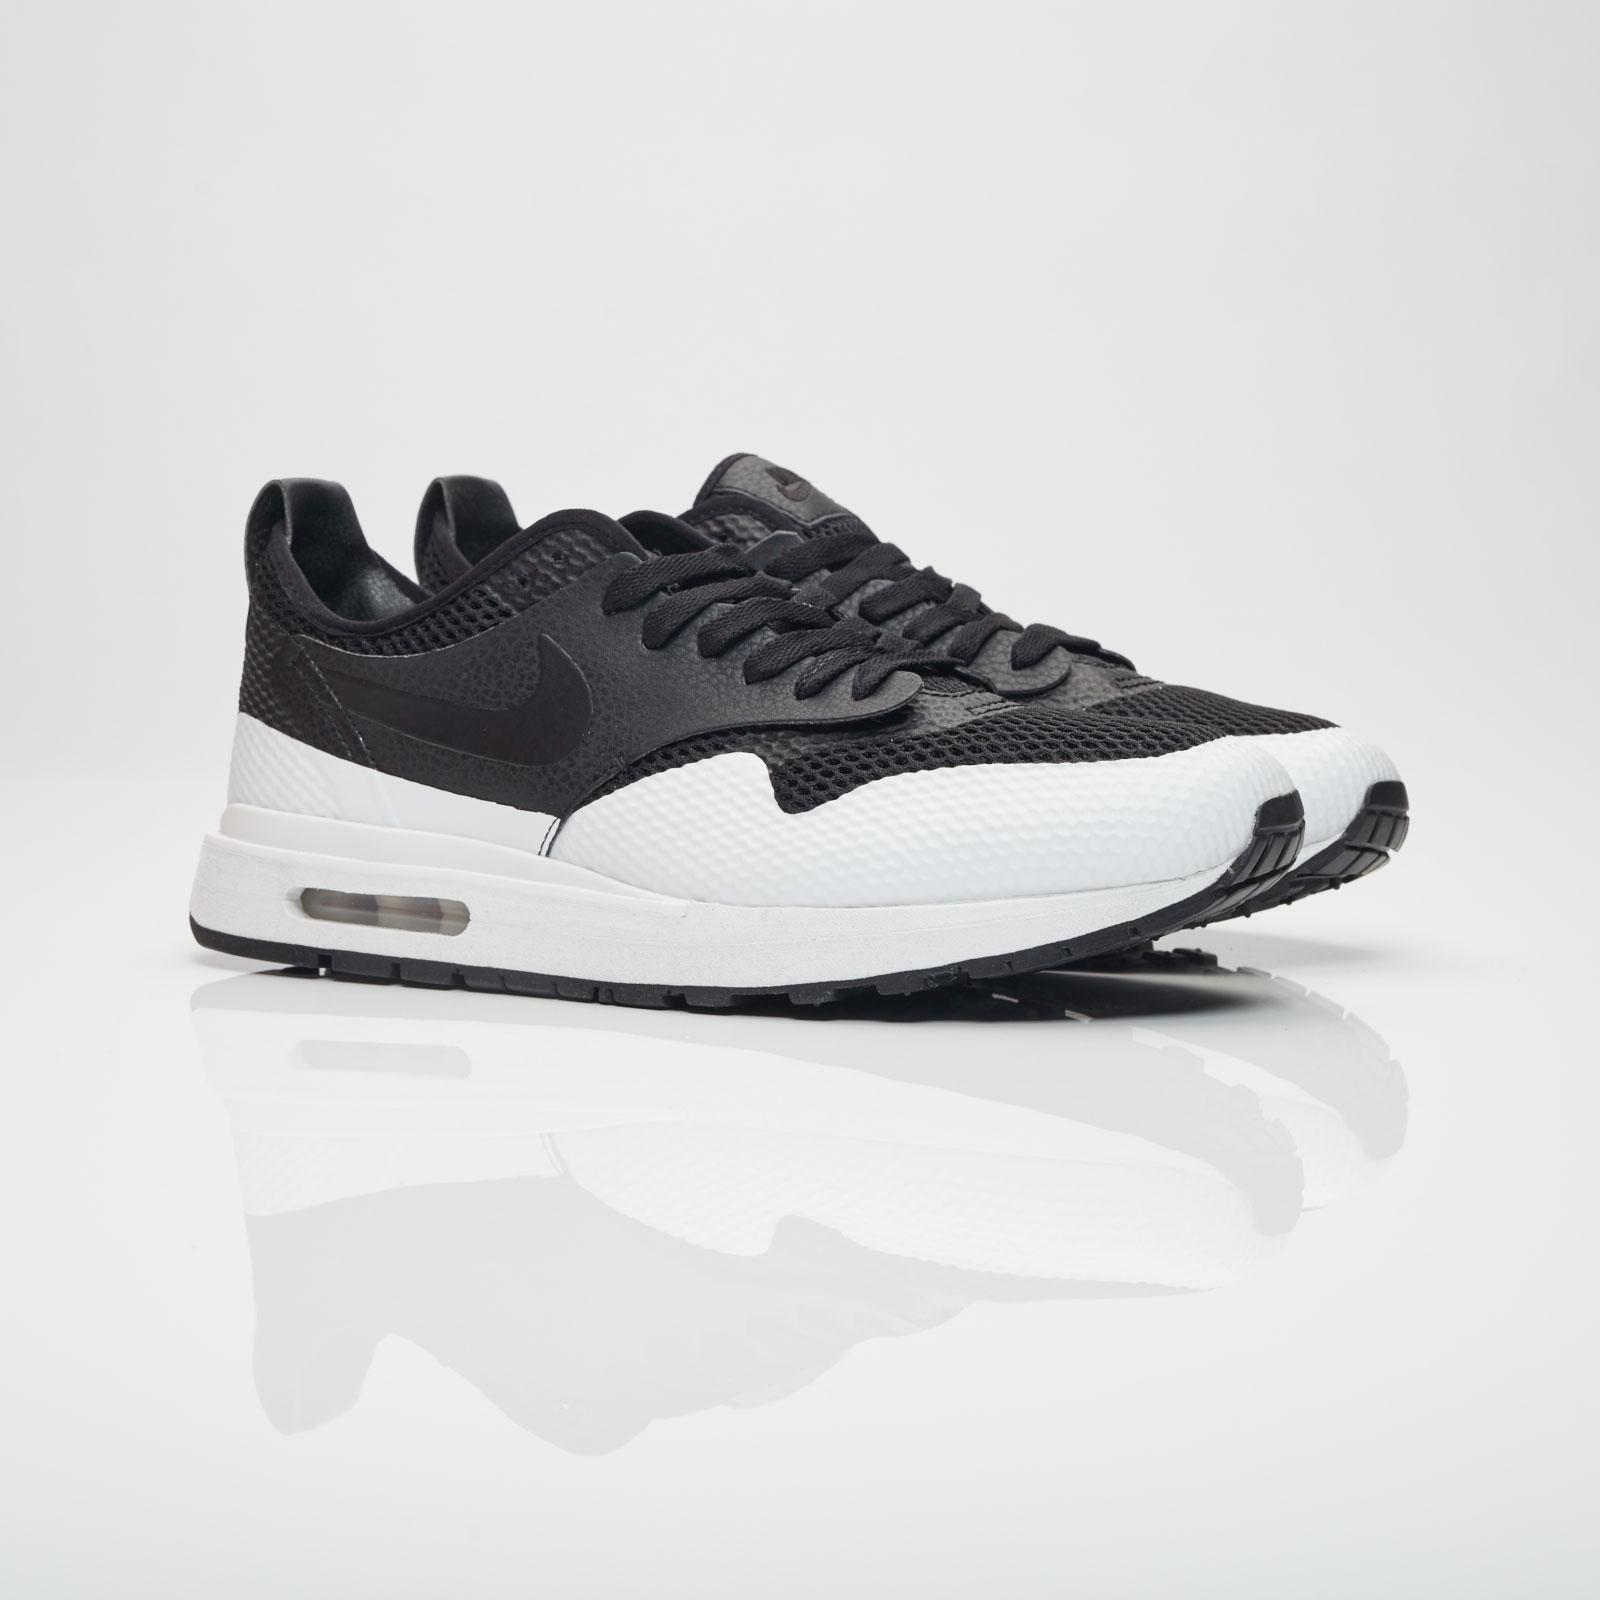 Nike Air Max 1 Royal SE SP - Aa0869-001 - Sneakersnstuff  933b01b610